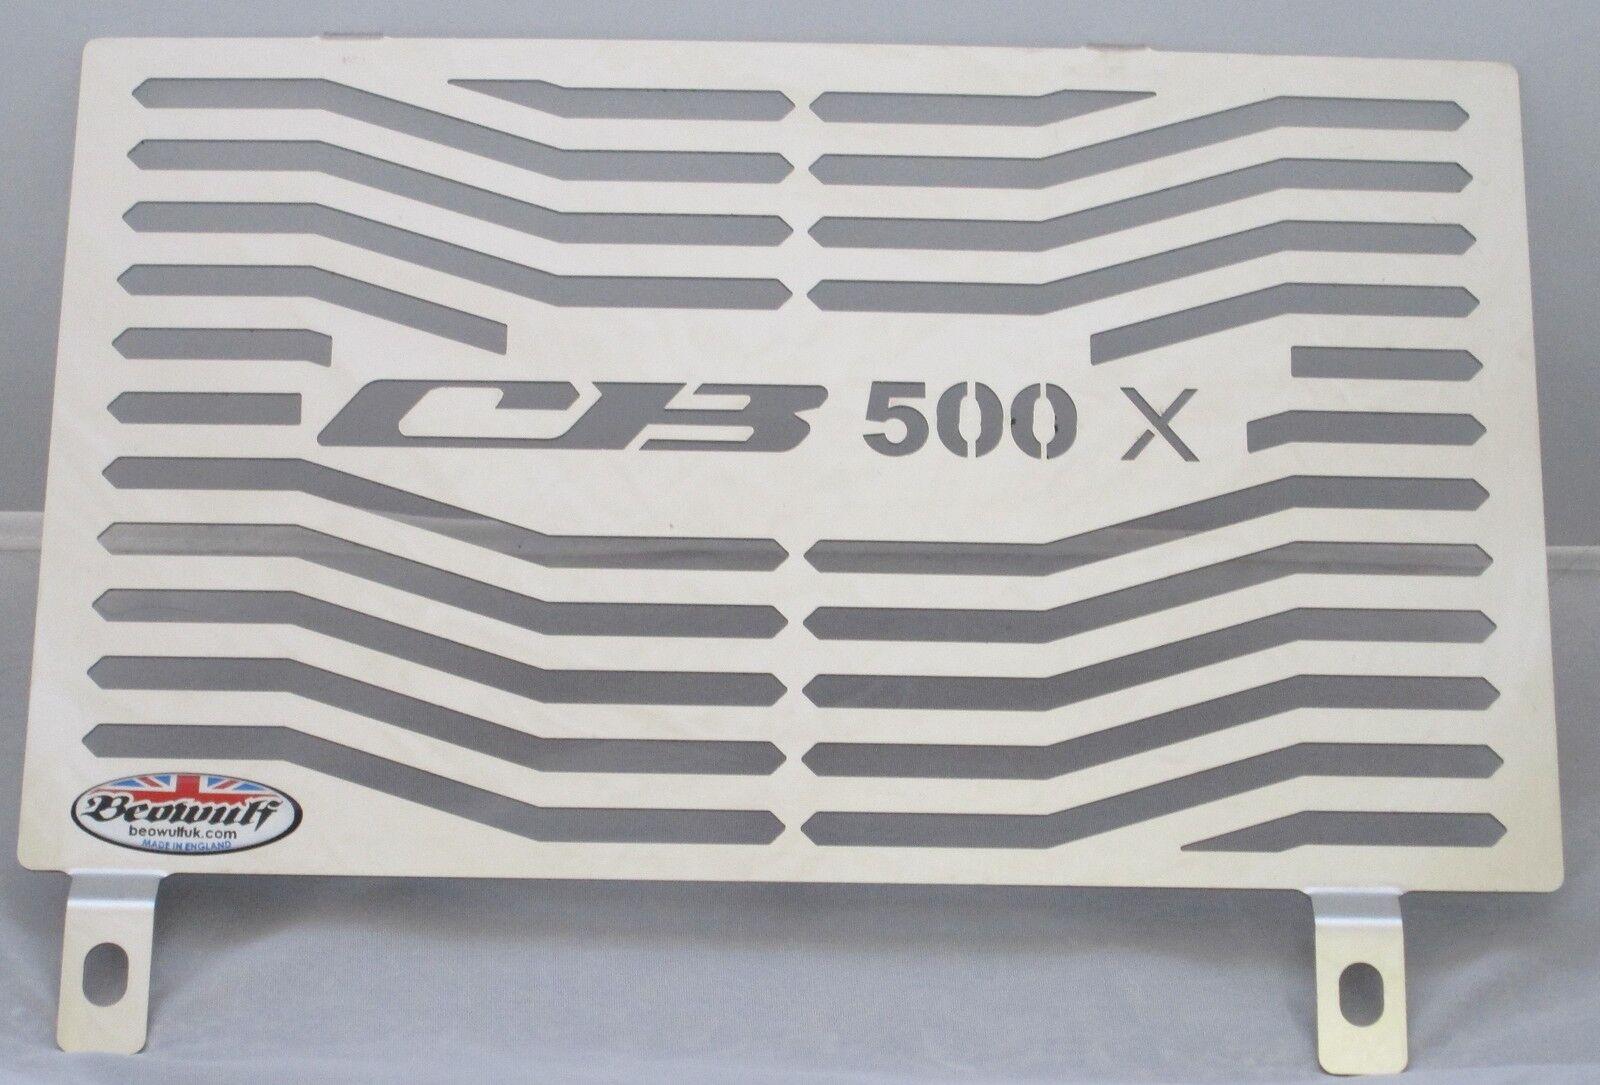 Protector radiador $(KGrHqZ,!o4FHE))5dinBR5mWOSG0w~~60_57